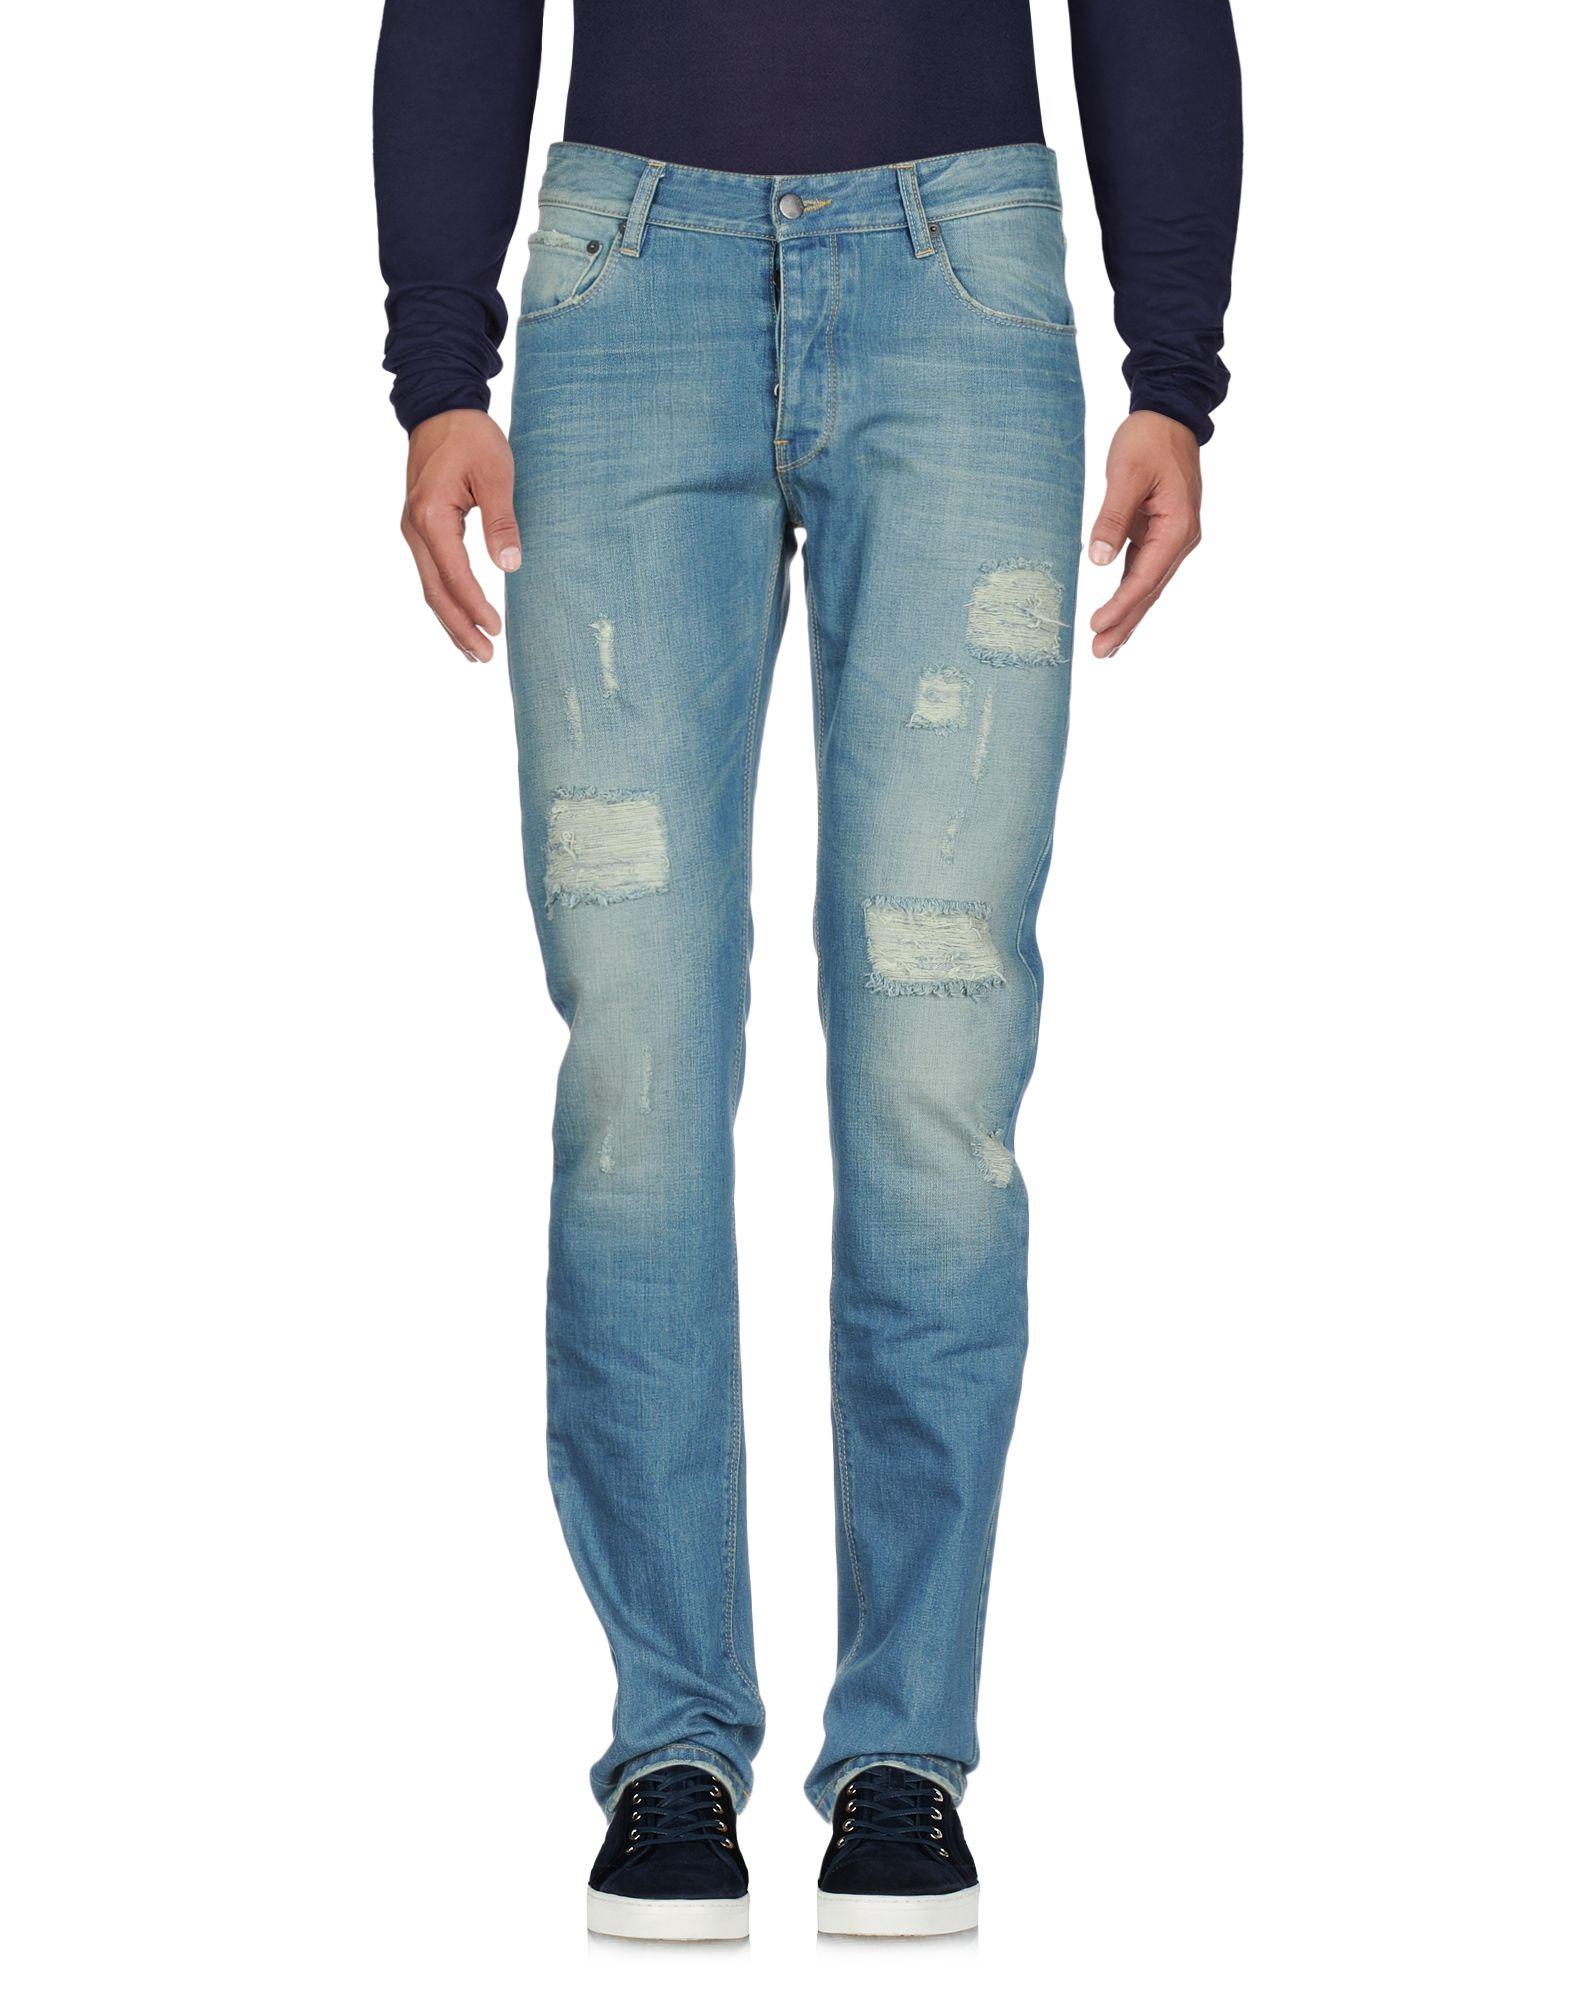 RAF BY RAF SIMONS Джинсовые брюки цены онлайн